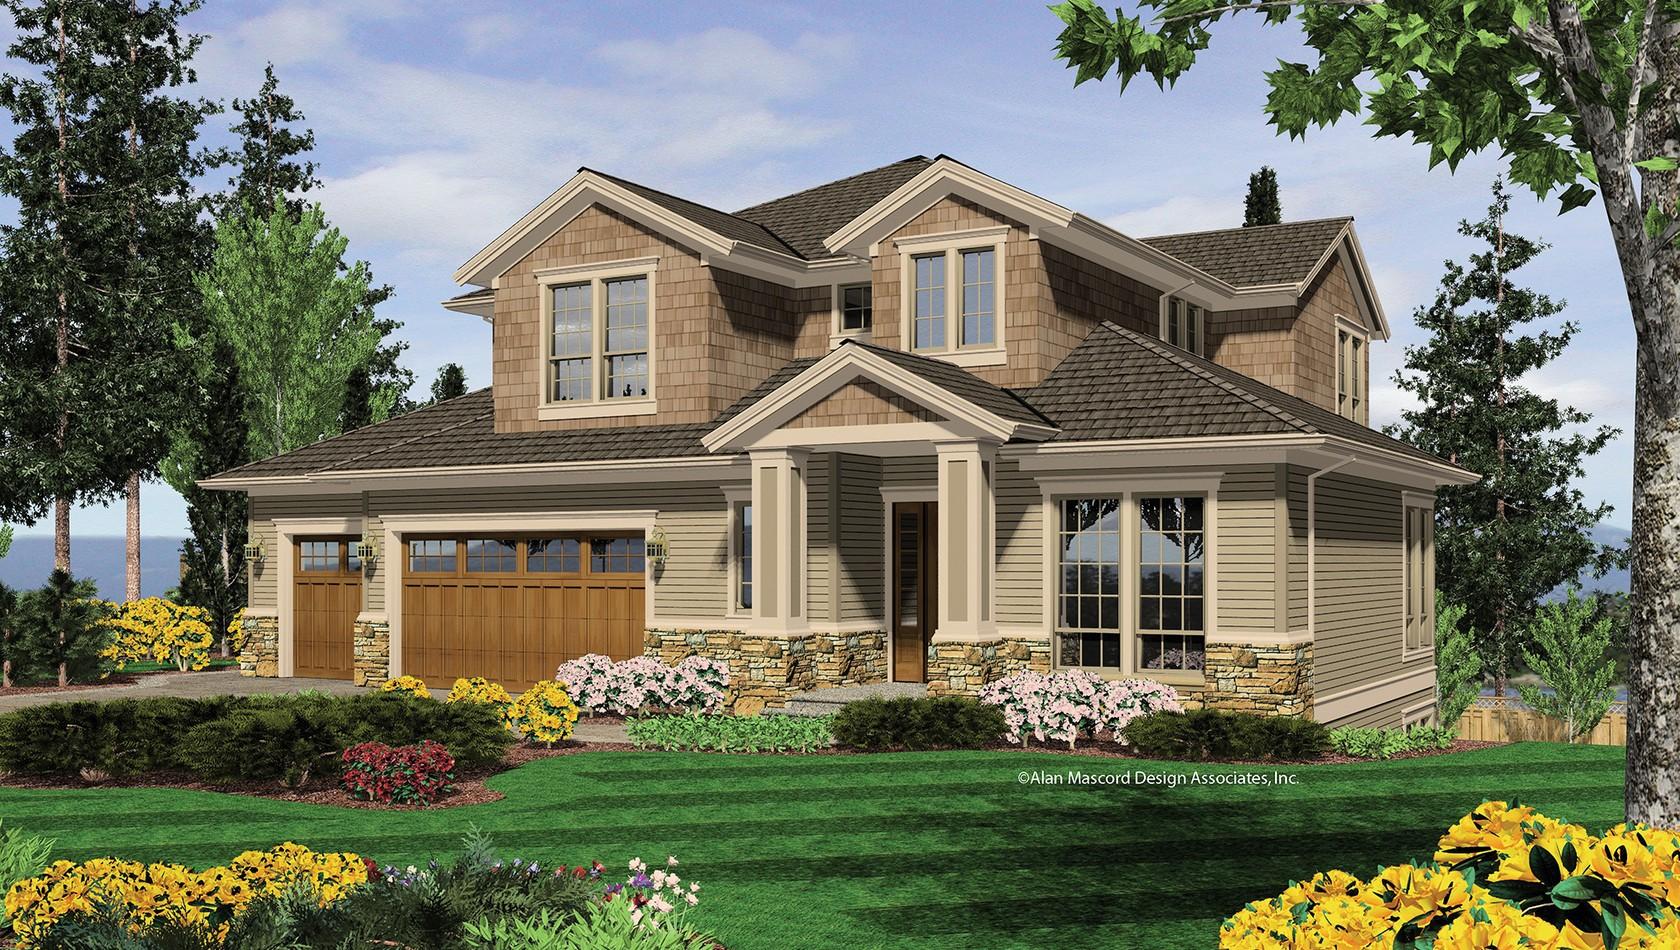 Main image for house plan 2376: The Bainbridge